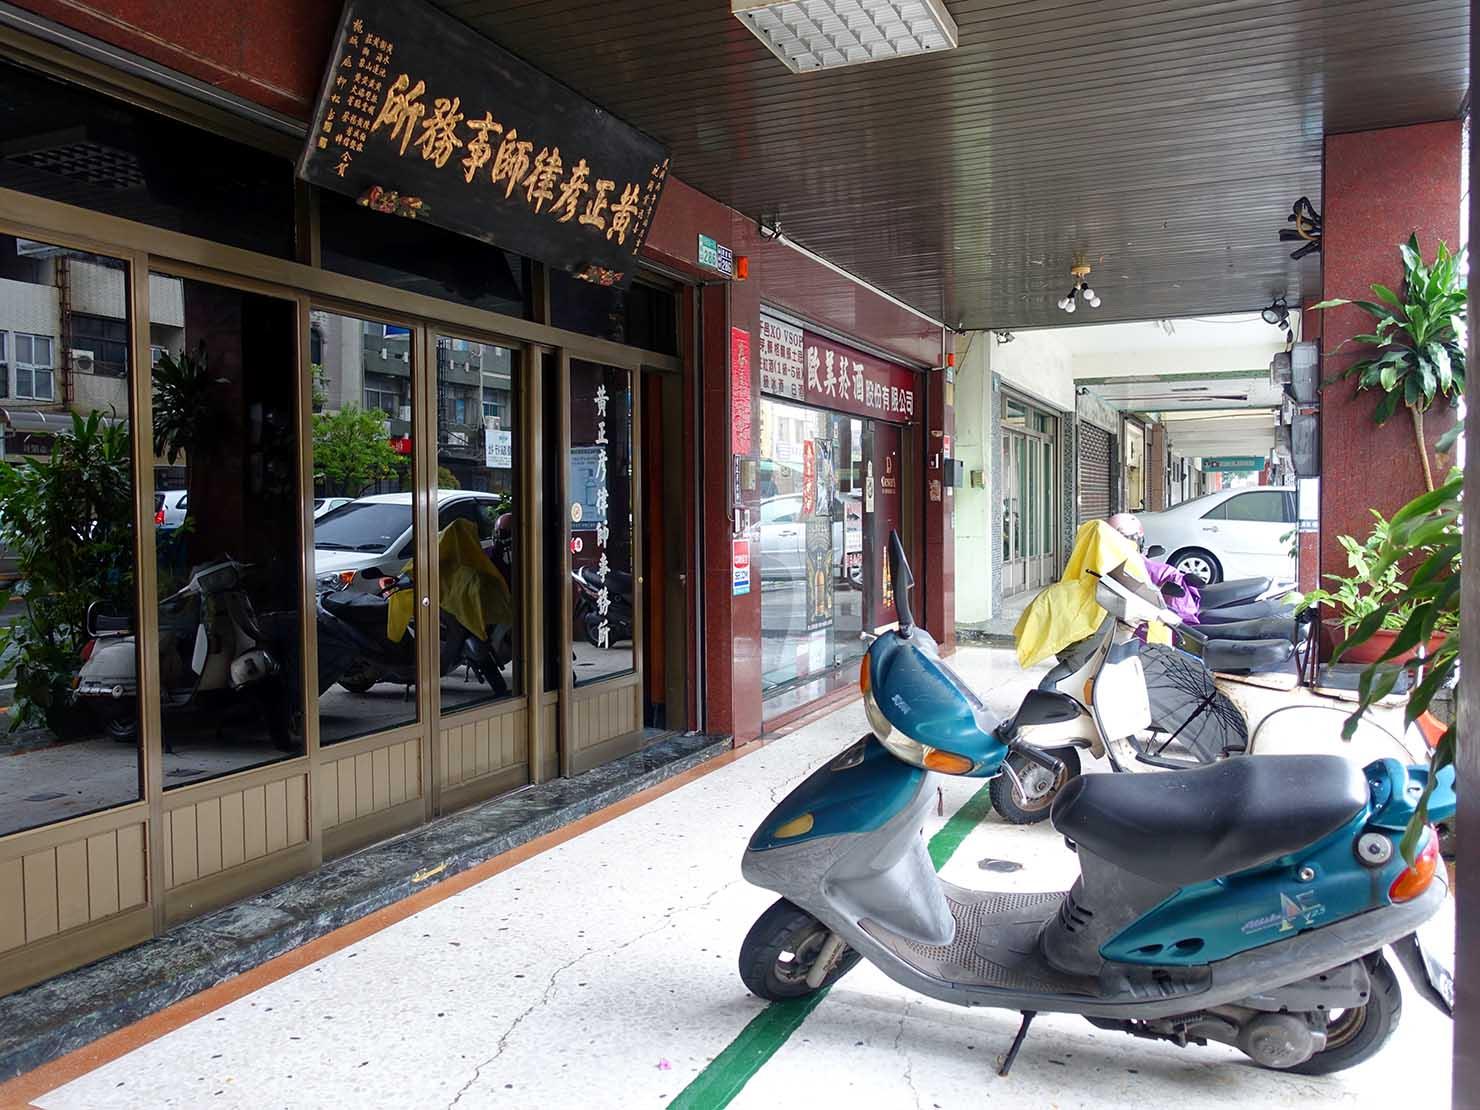 台南「府城路一段」の騎樓